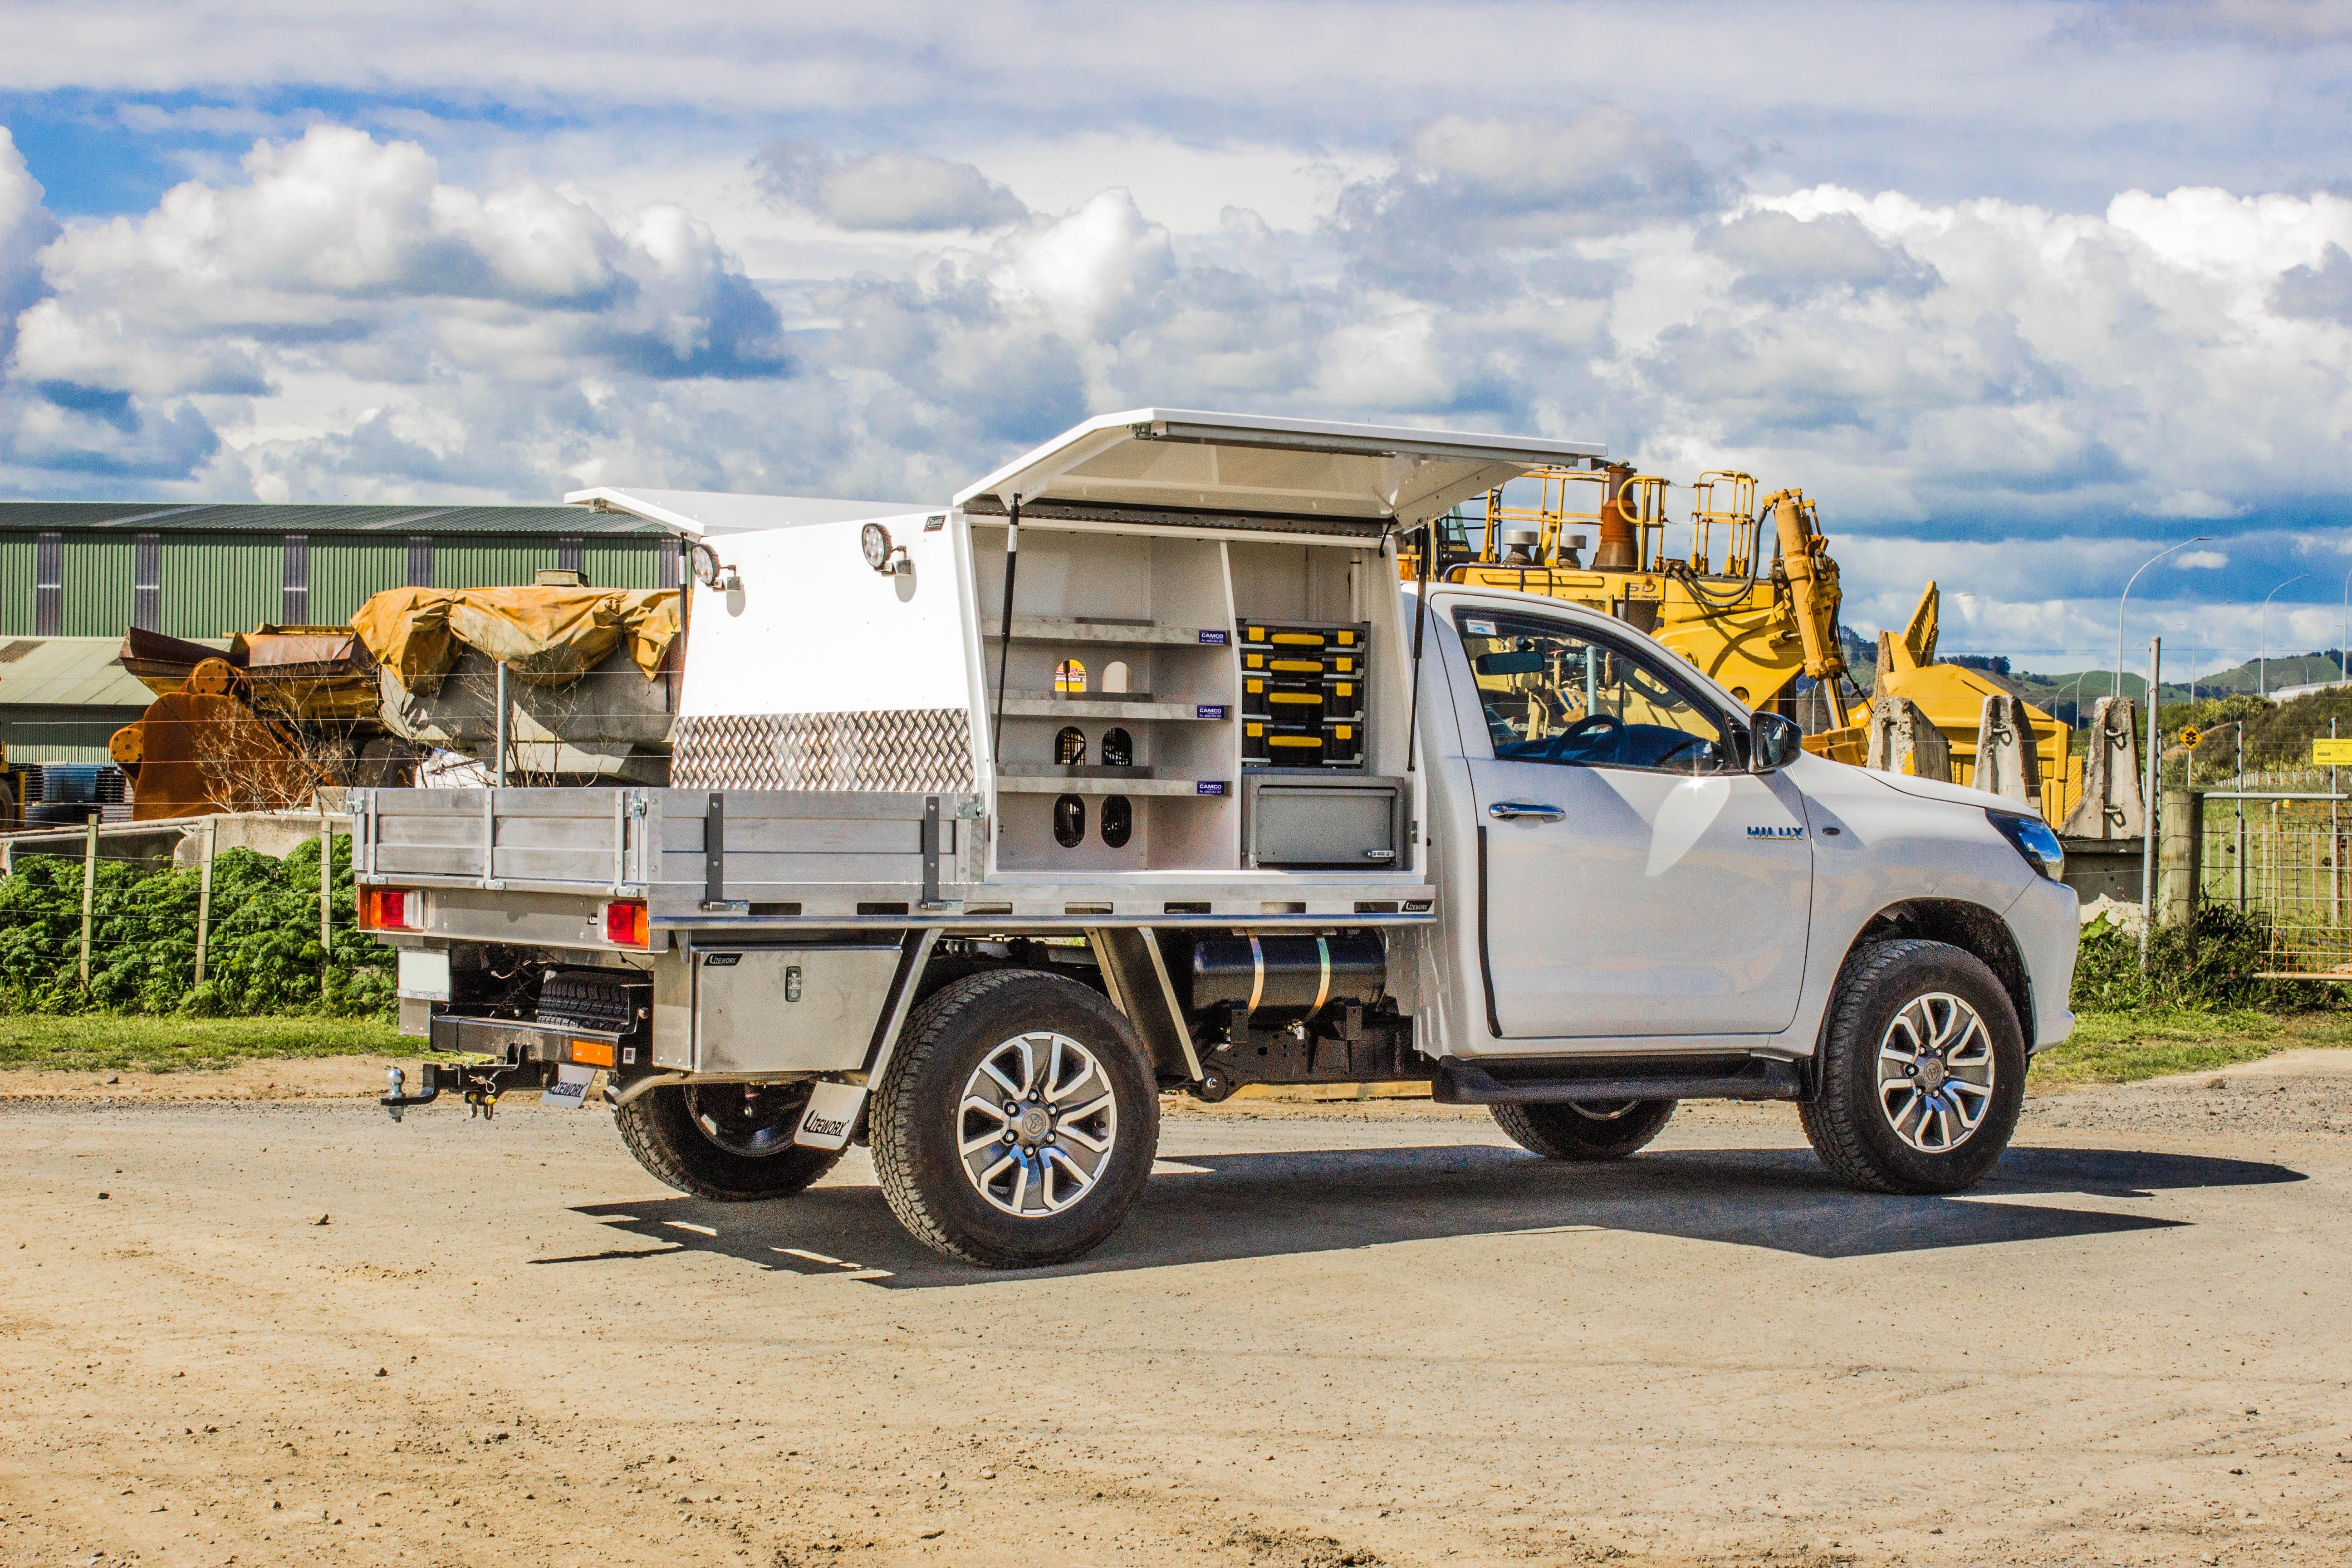 Toyota Hilux Fitouts - Flat Deck + Service Body Fitout